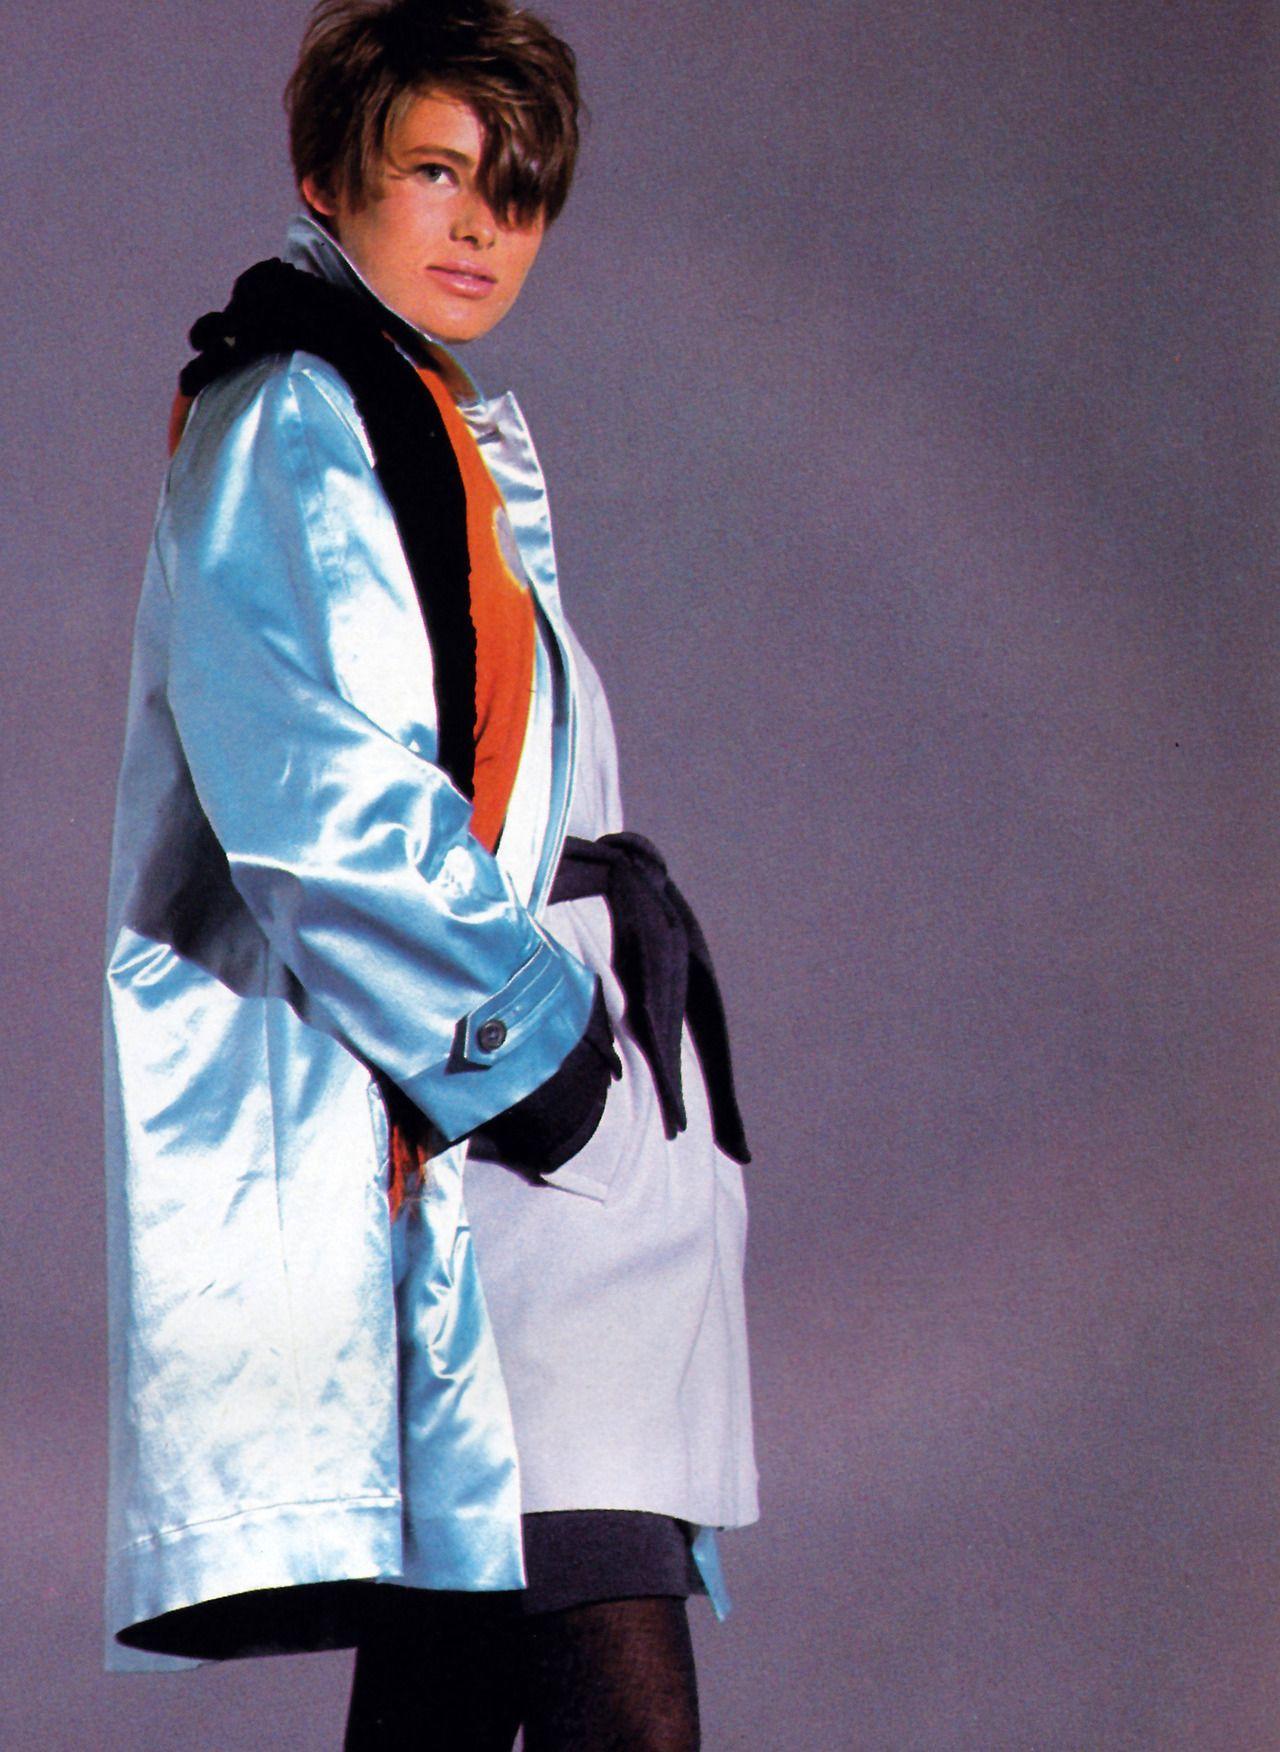 Nathaniel Kramer for Flare magazine, November 1990. Clothing by Perry Ellis.